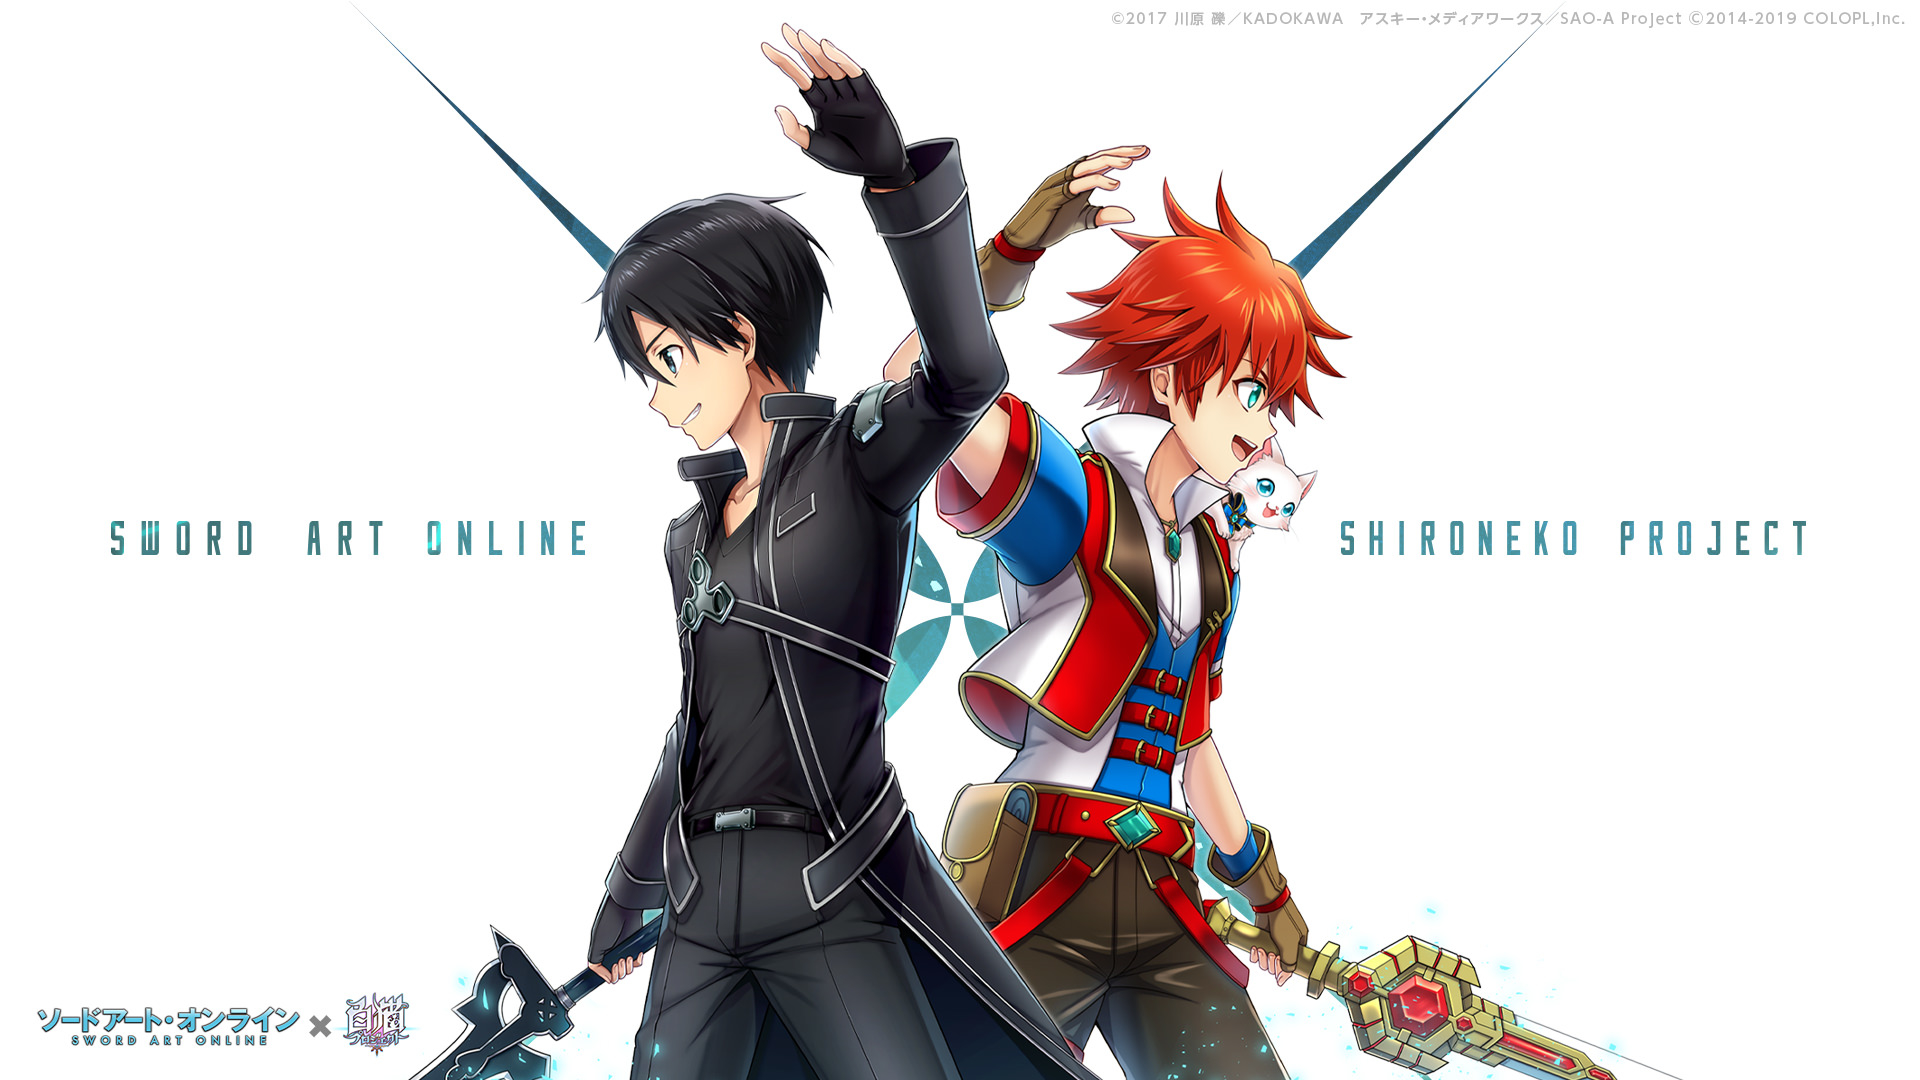 2560x1440 Kazuto Kirigaya And Kirito 1440p Resolution Wallpaper Hd Anime 4k Wallpapers Images Photos And Background